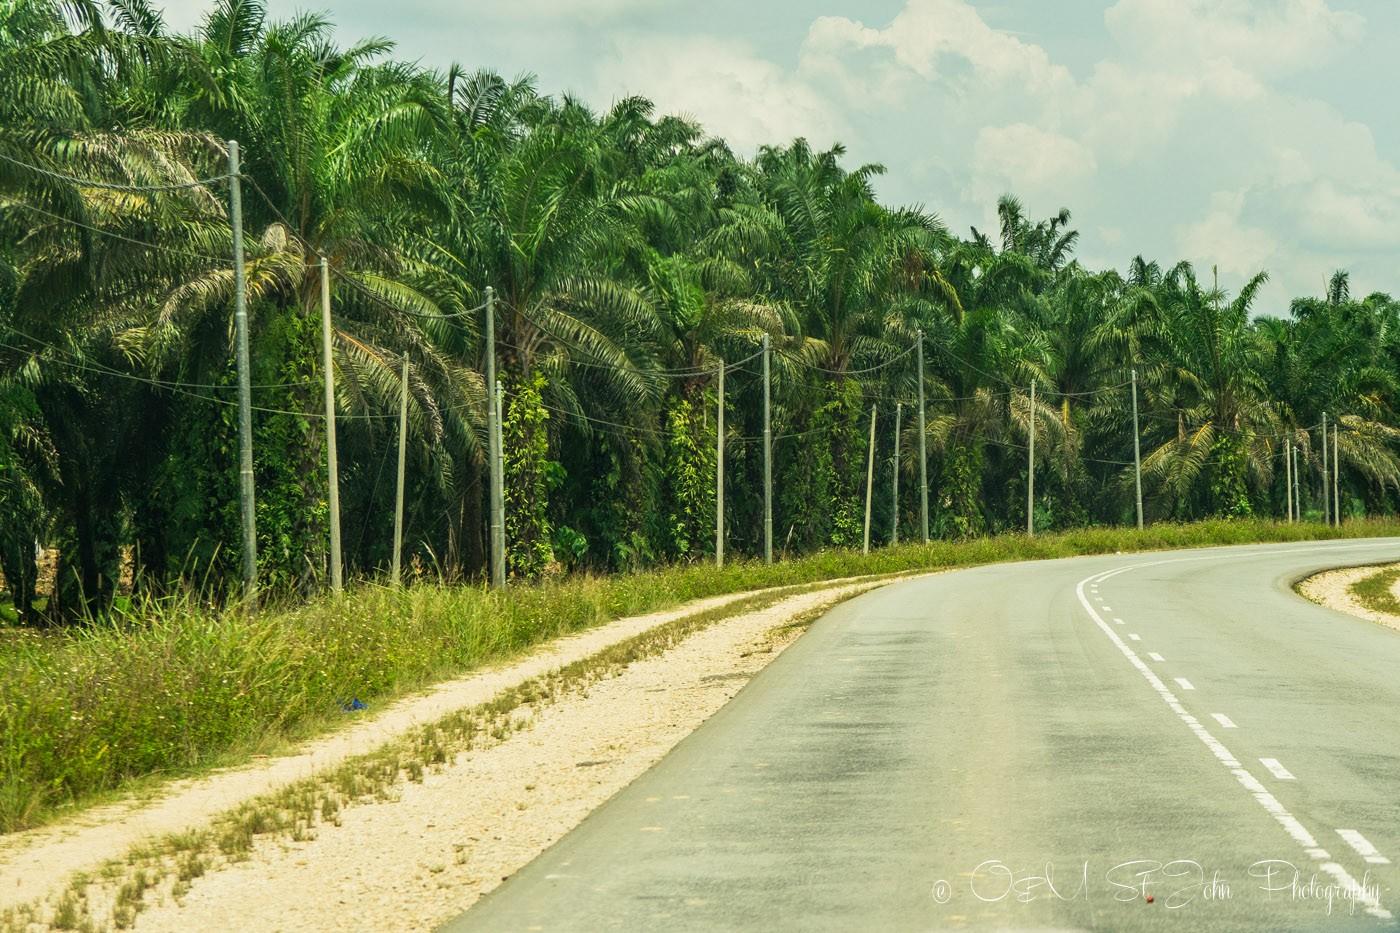 Palm oil plantation en route to Kinabatangan. Sabah. Malaysian Borneo